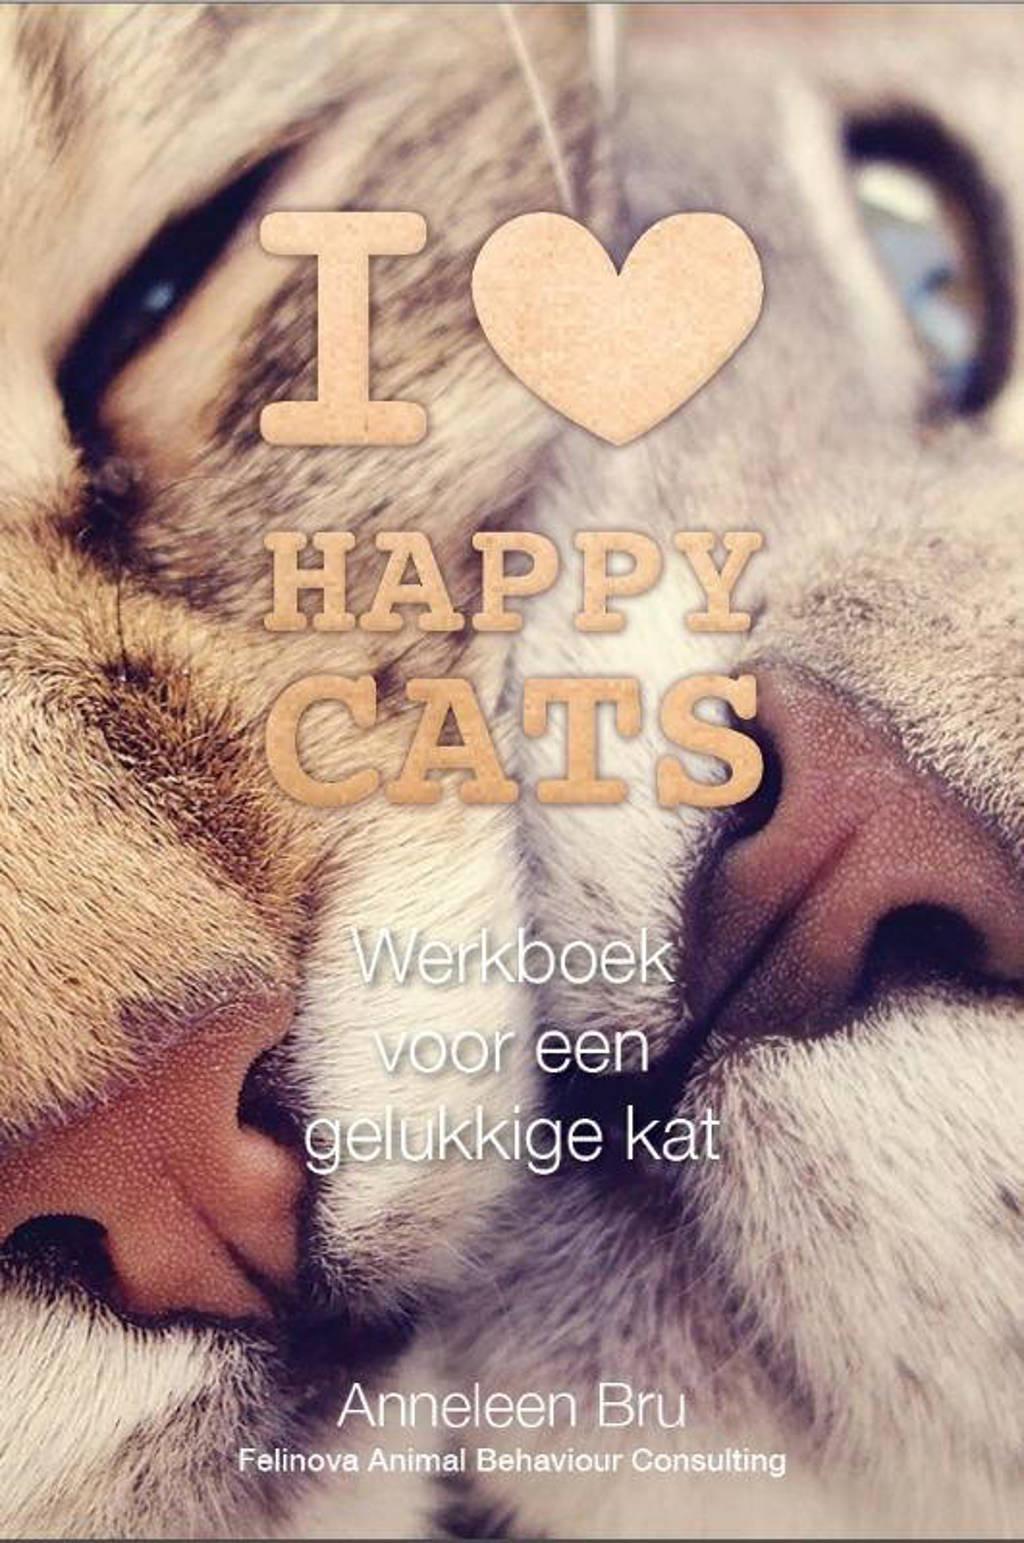 I love happy cats - Anneleen Bru